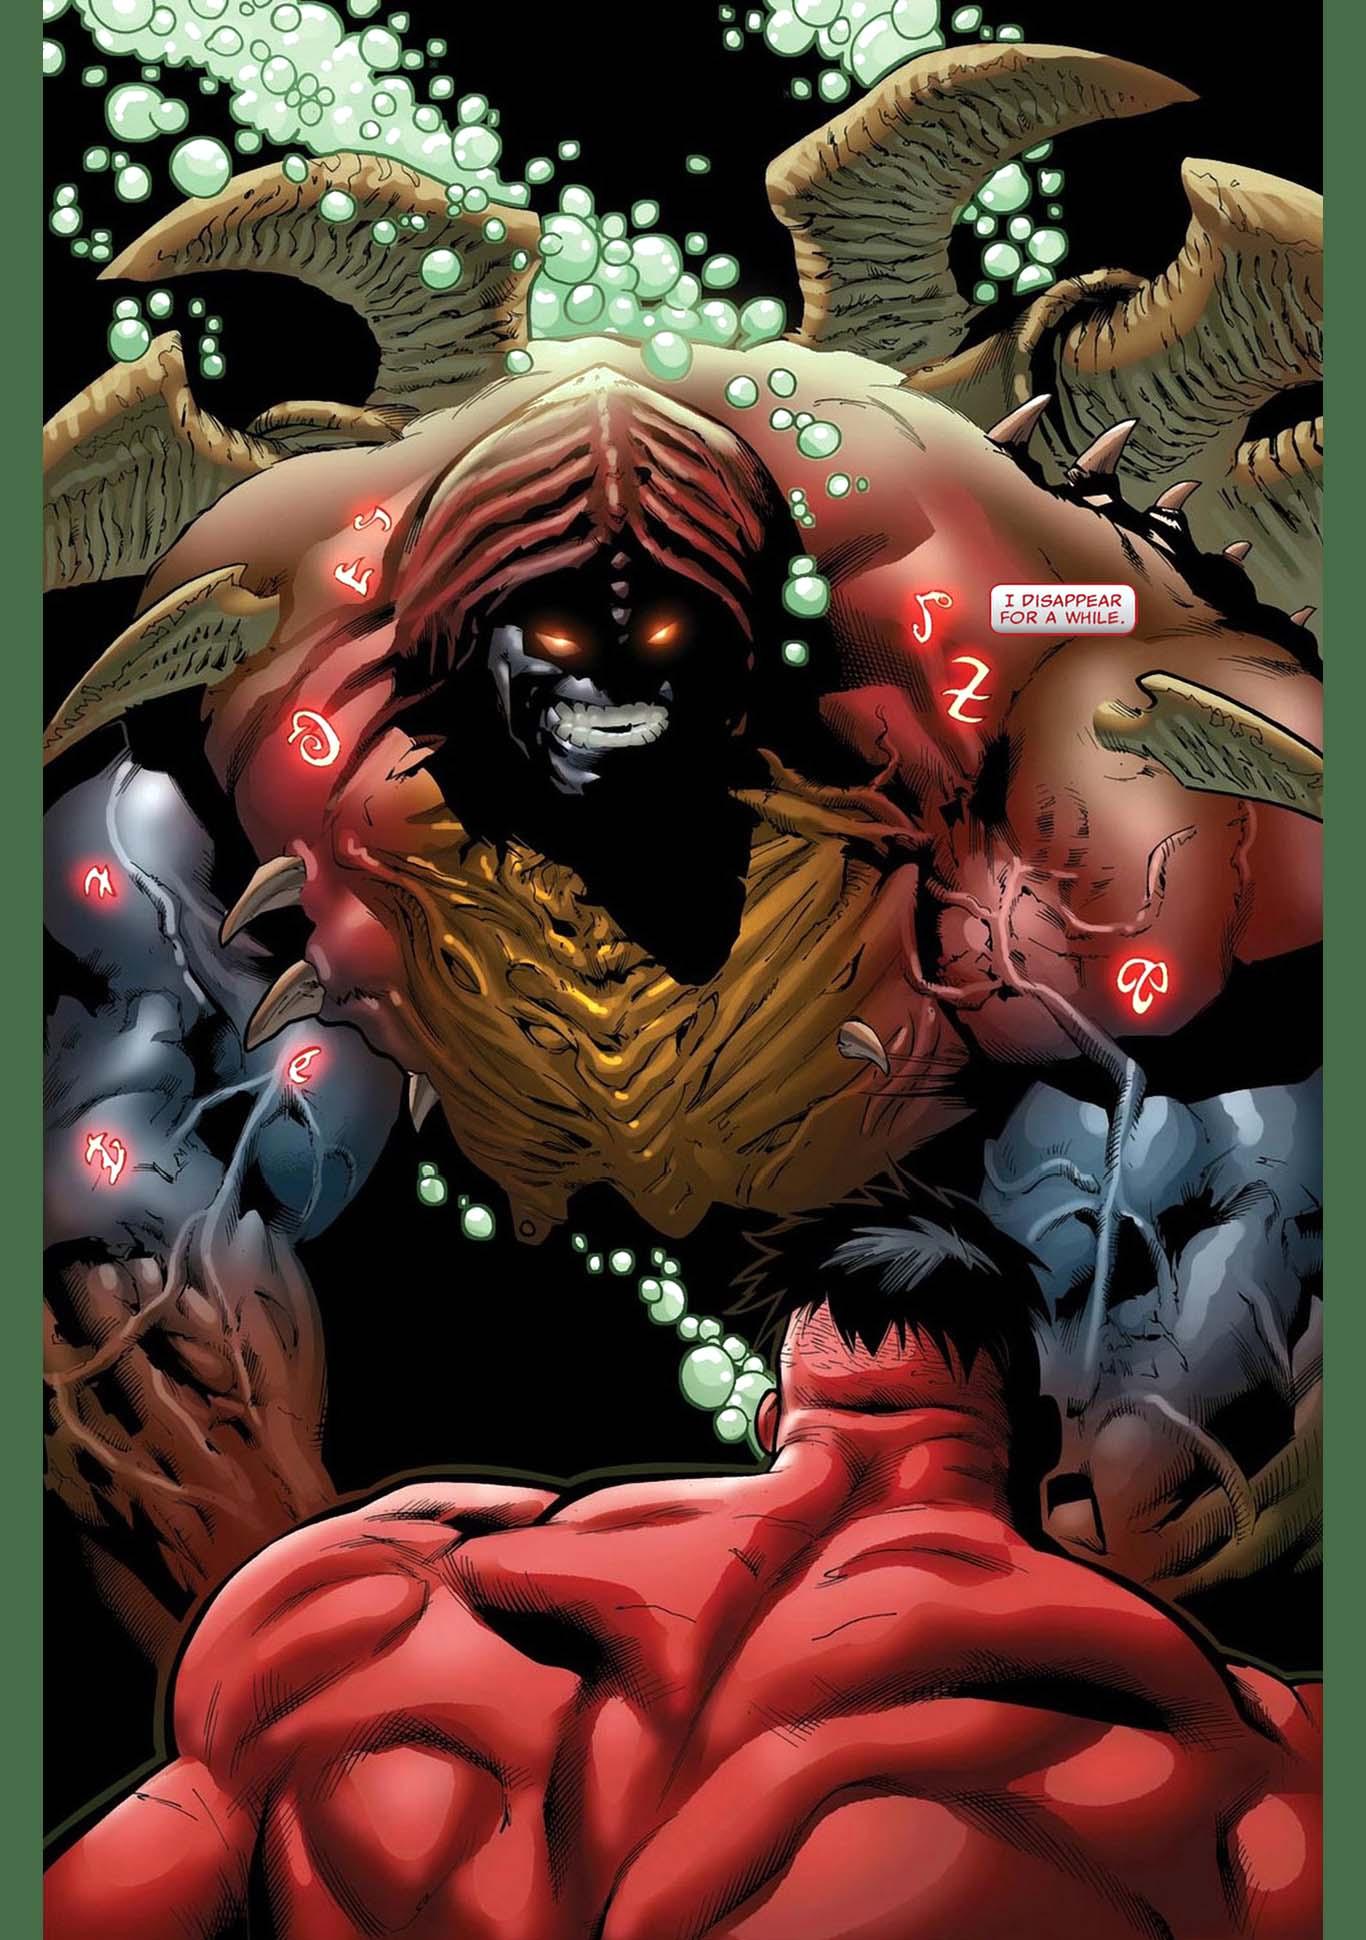 Hulk - The Incredible Hulk Wallpaper (14044481) - Fanpop